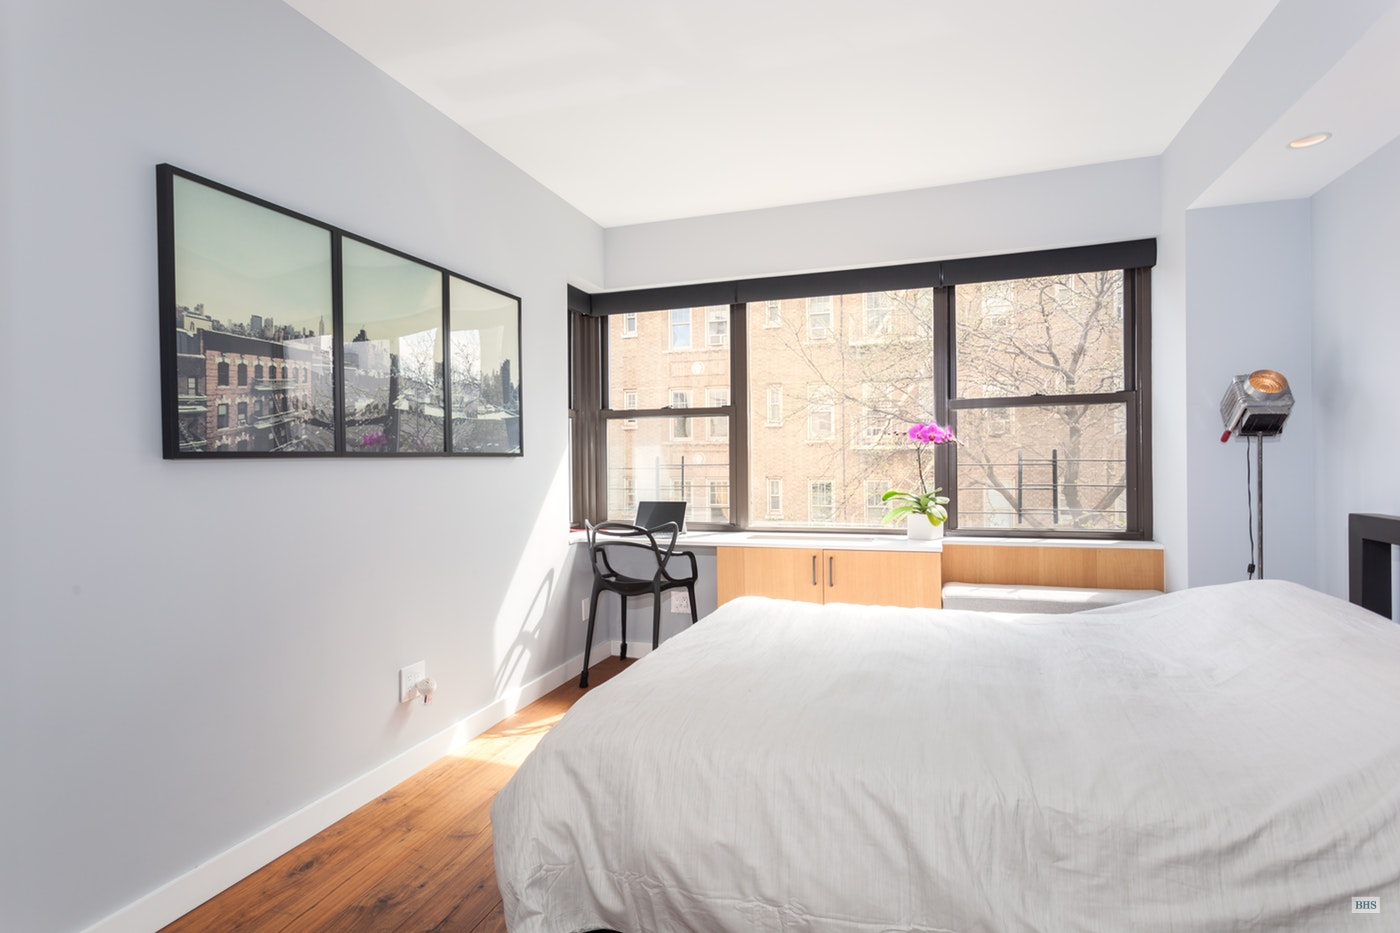 16486854-4-Bedroom-1.jpg